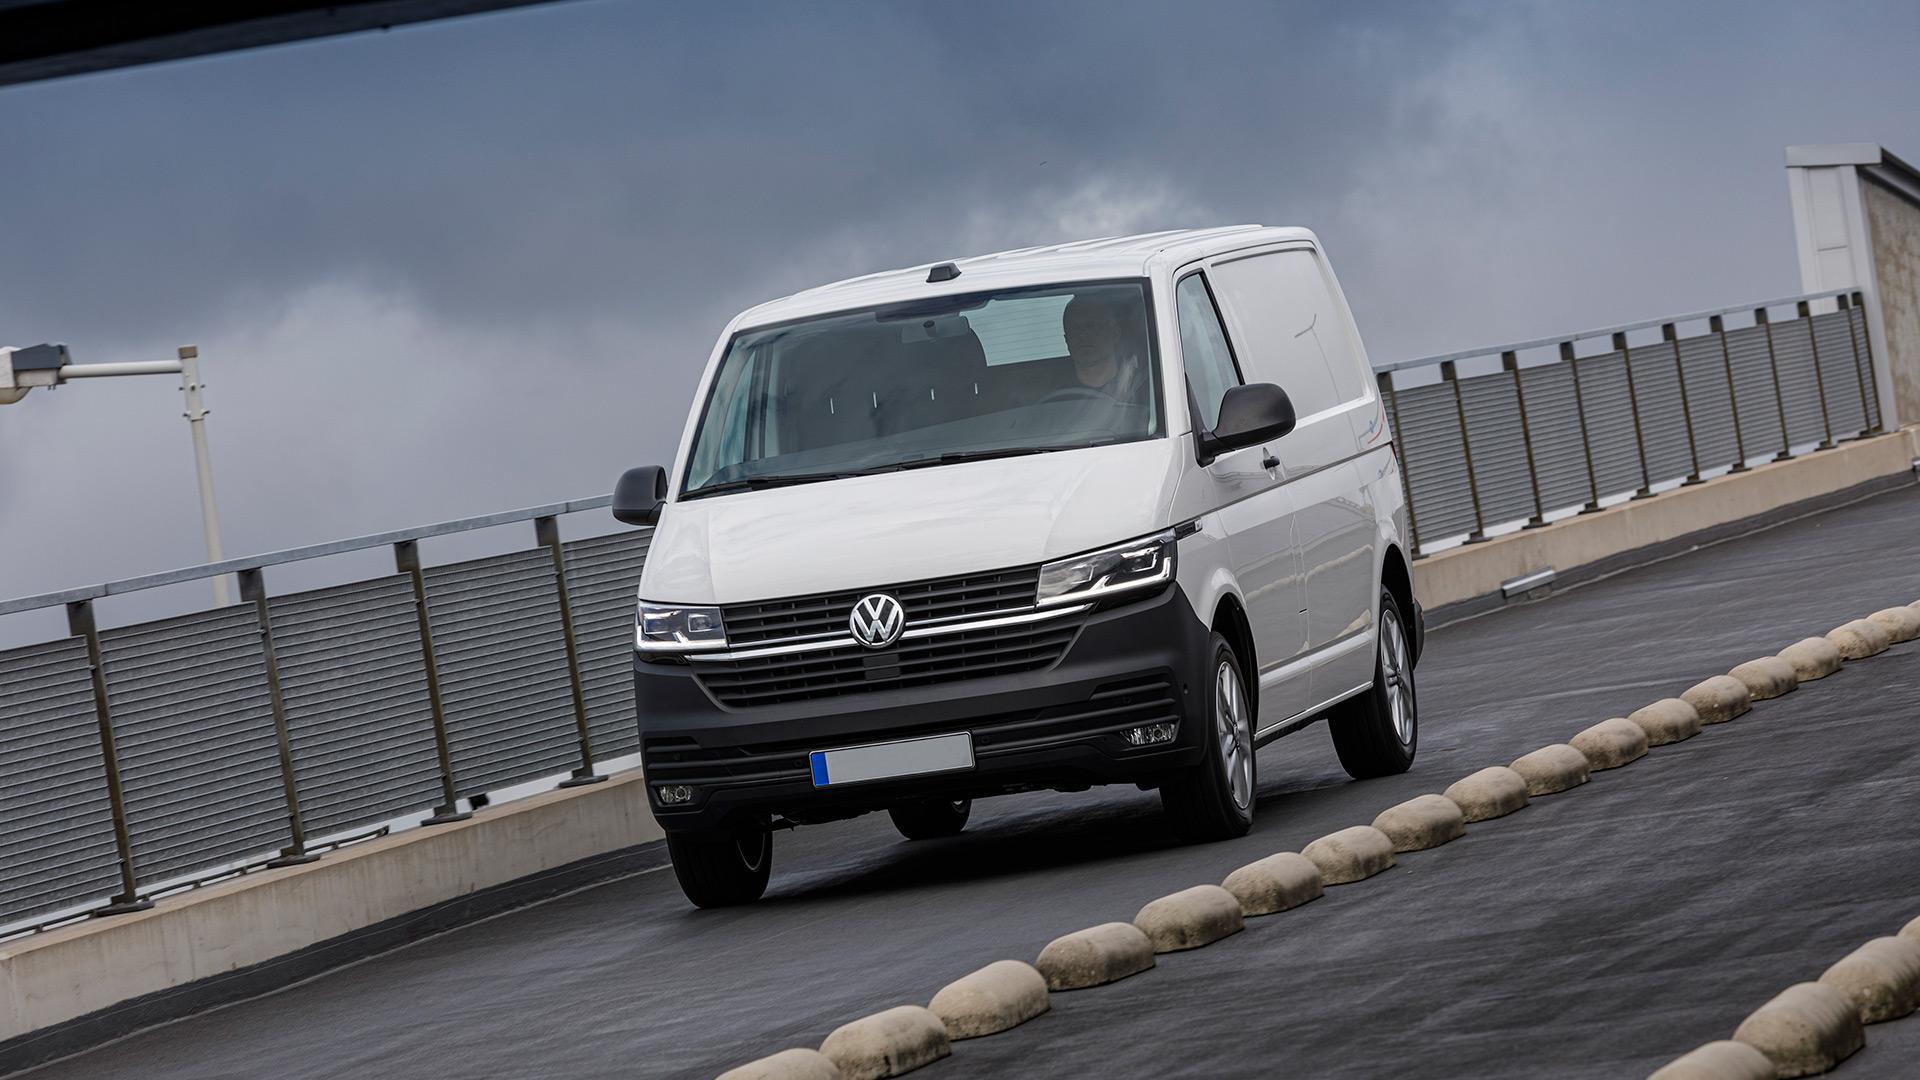 Volkswagen Transporter Furgón Corto Tn 2.0 Tdi